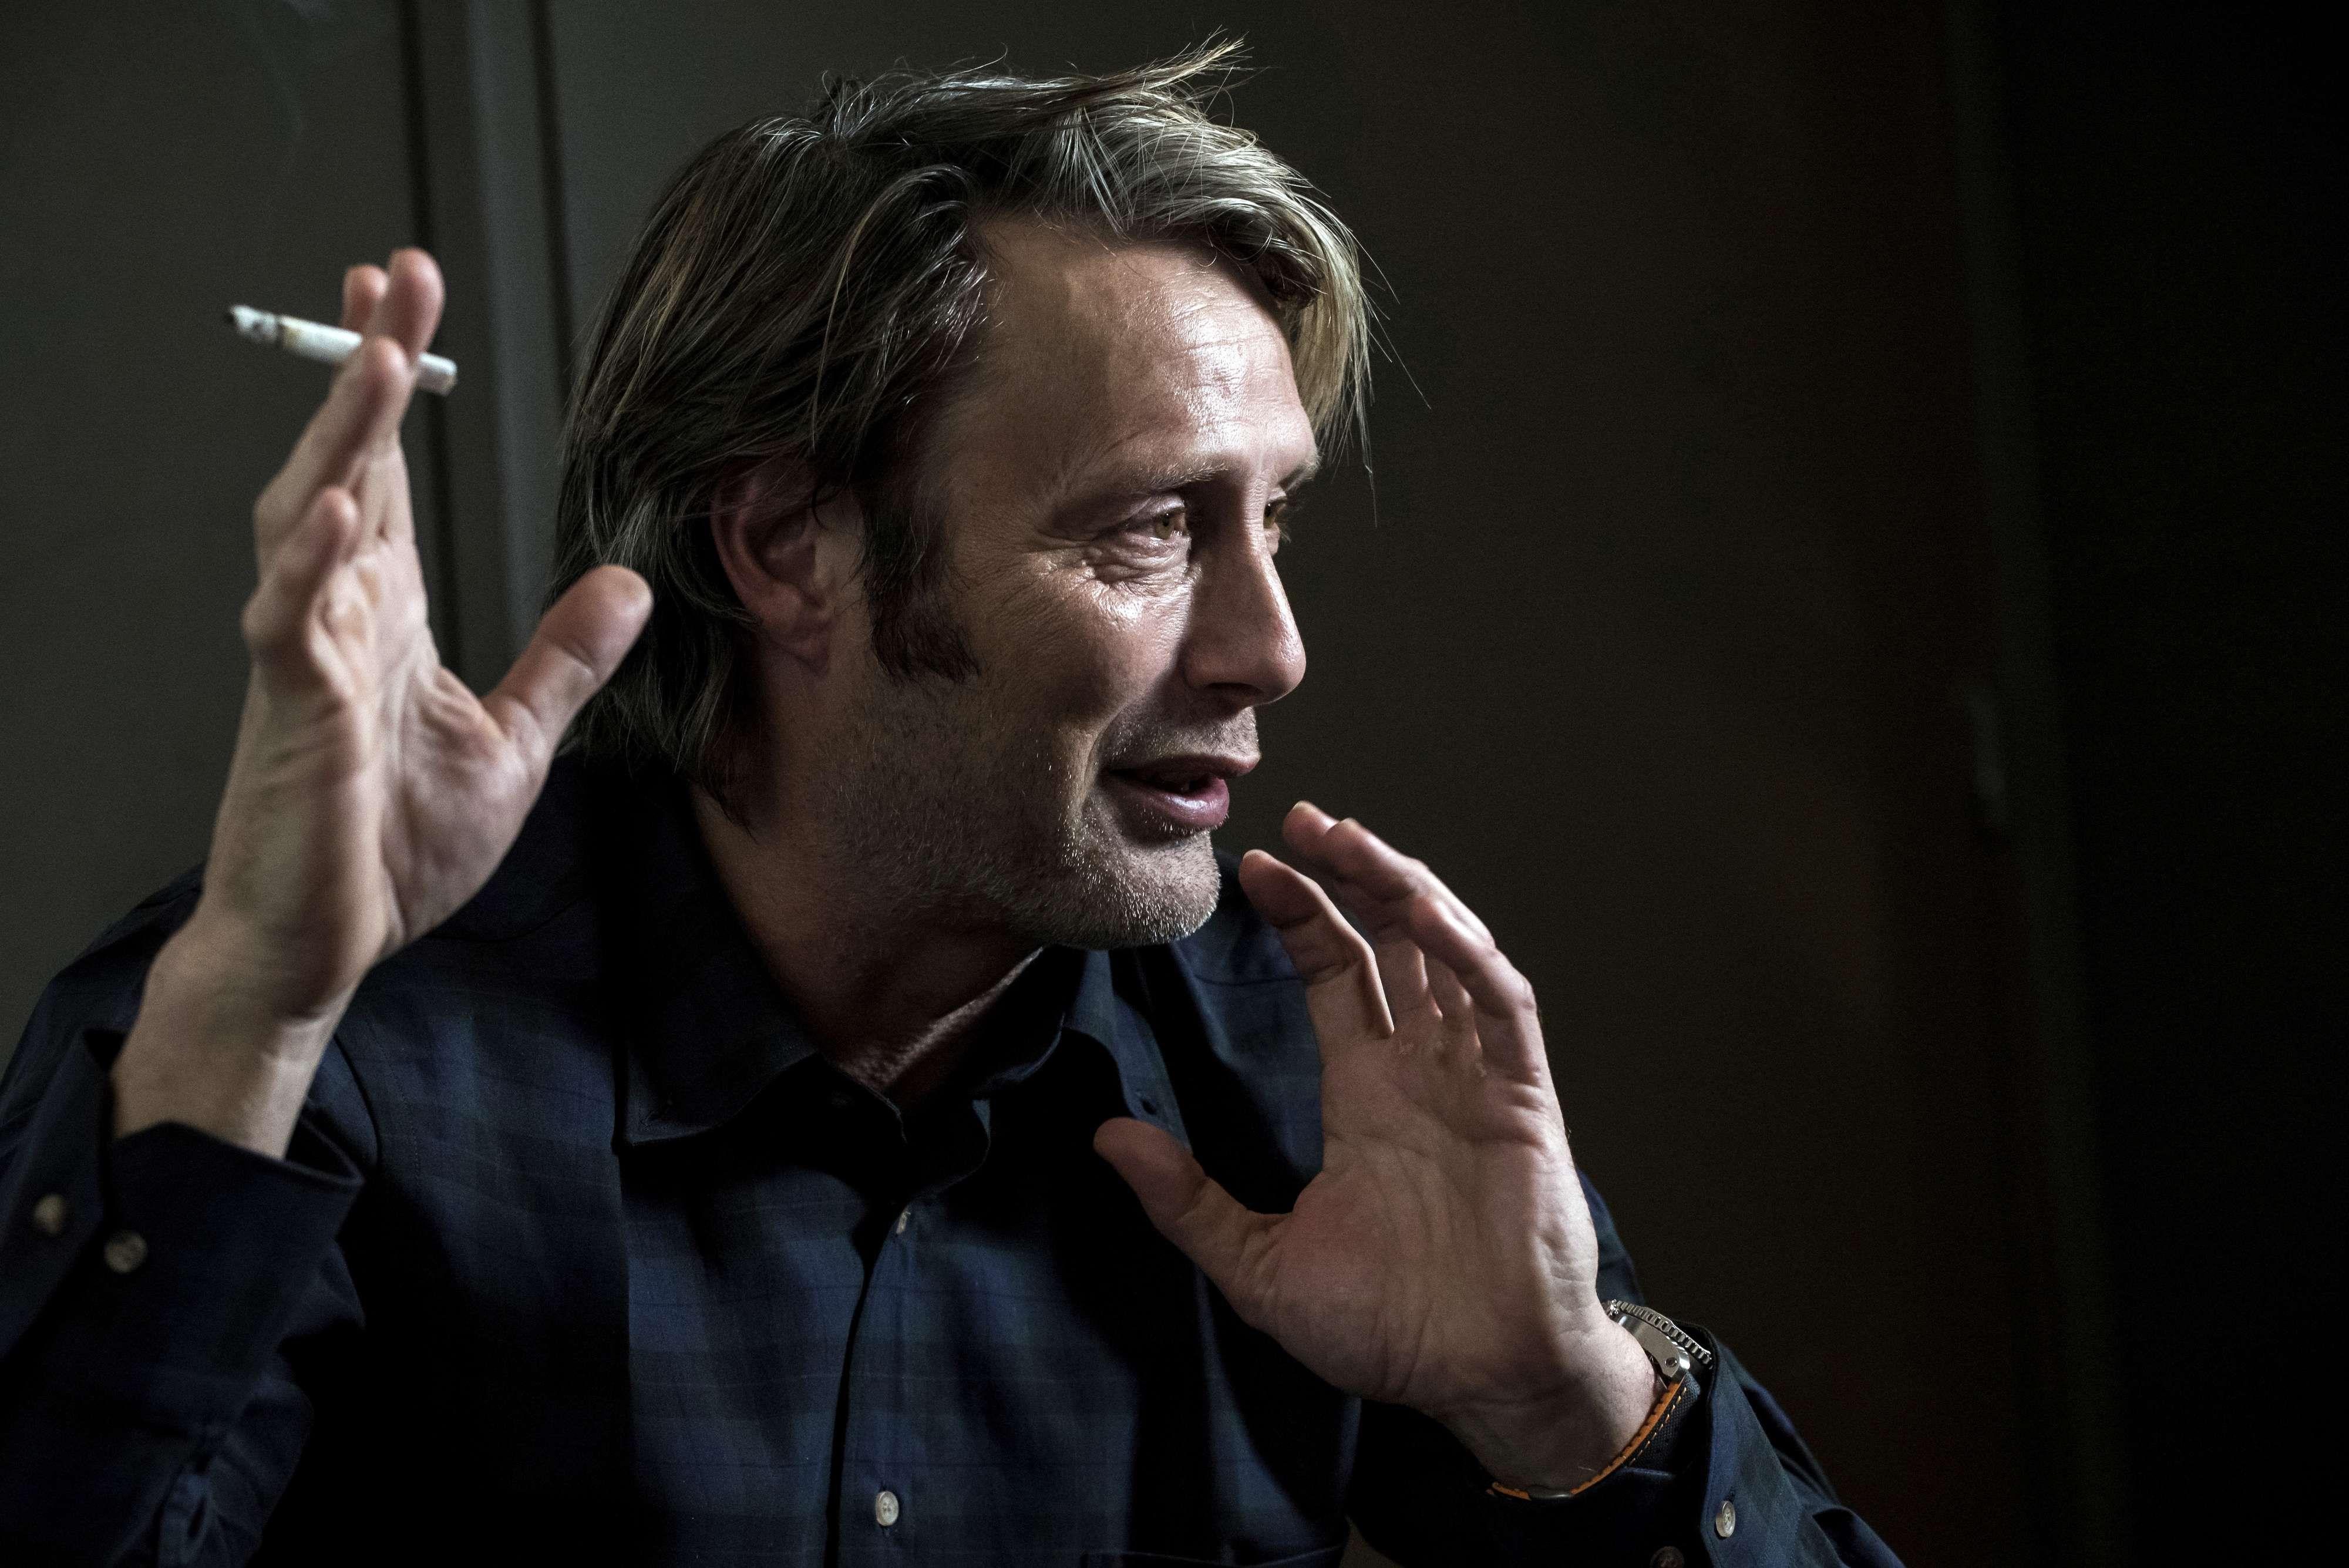 [October 14] 7th Festival Lumiere - Press Conference - 004 - Mads Mikkelsen Source